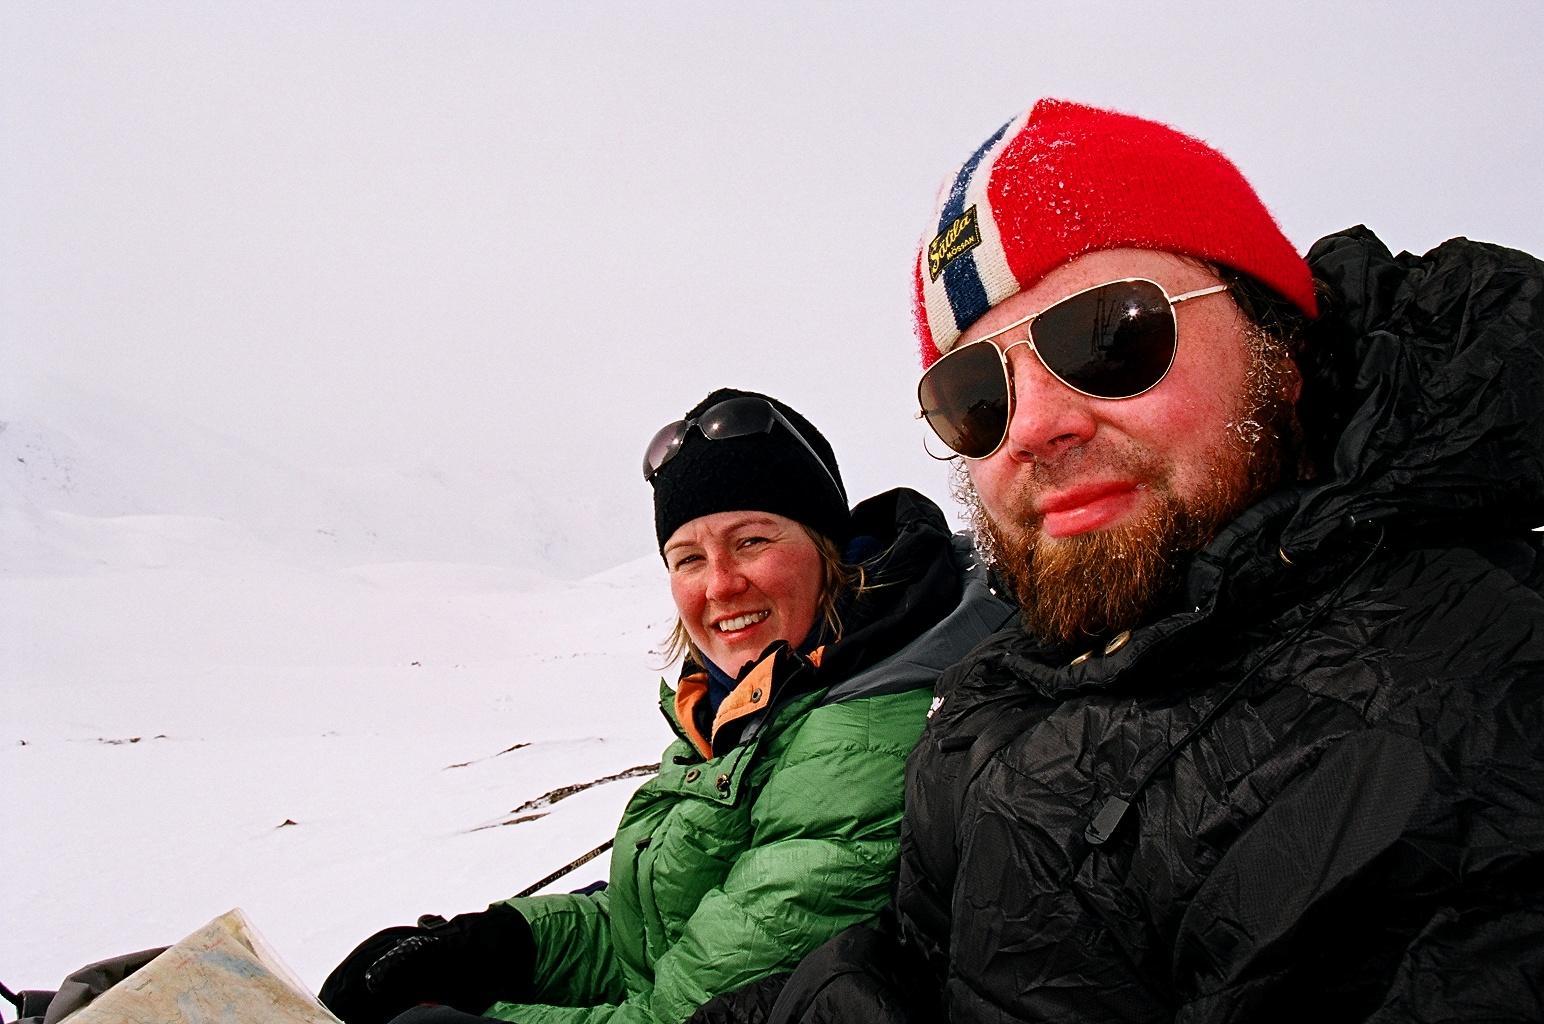 Påskerast i Tafjordfjella, på vei ned fra Torsnosi